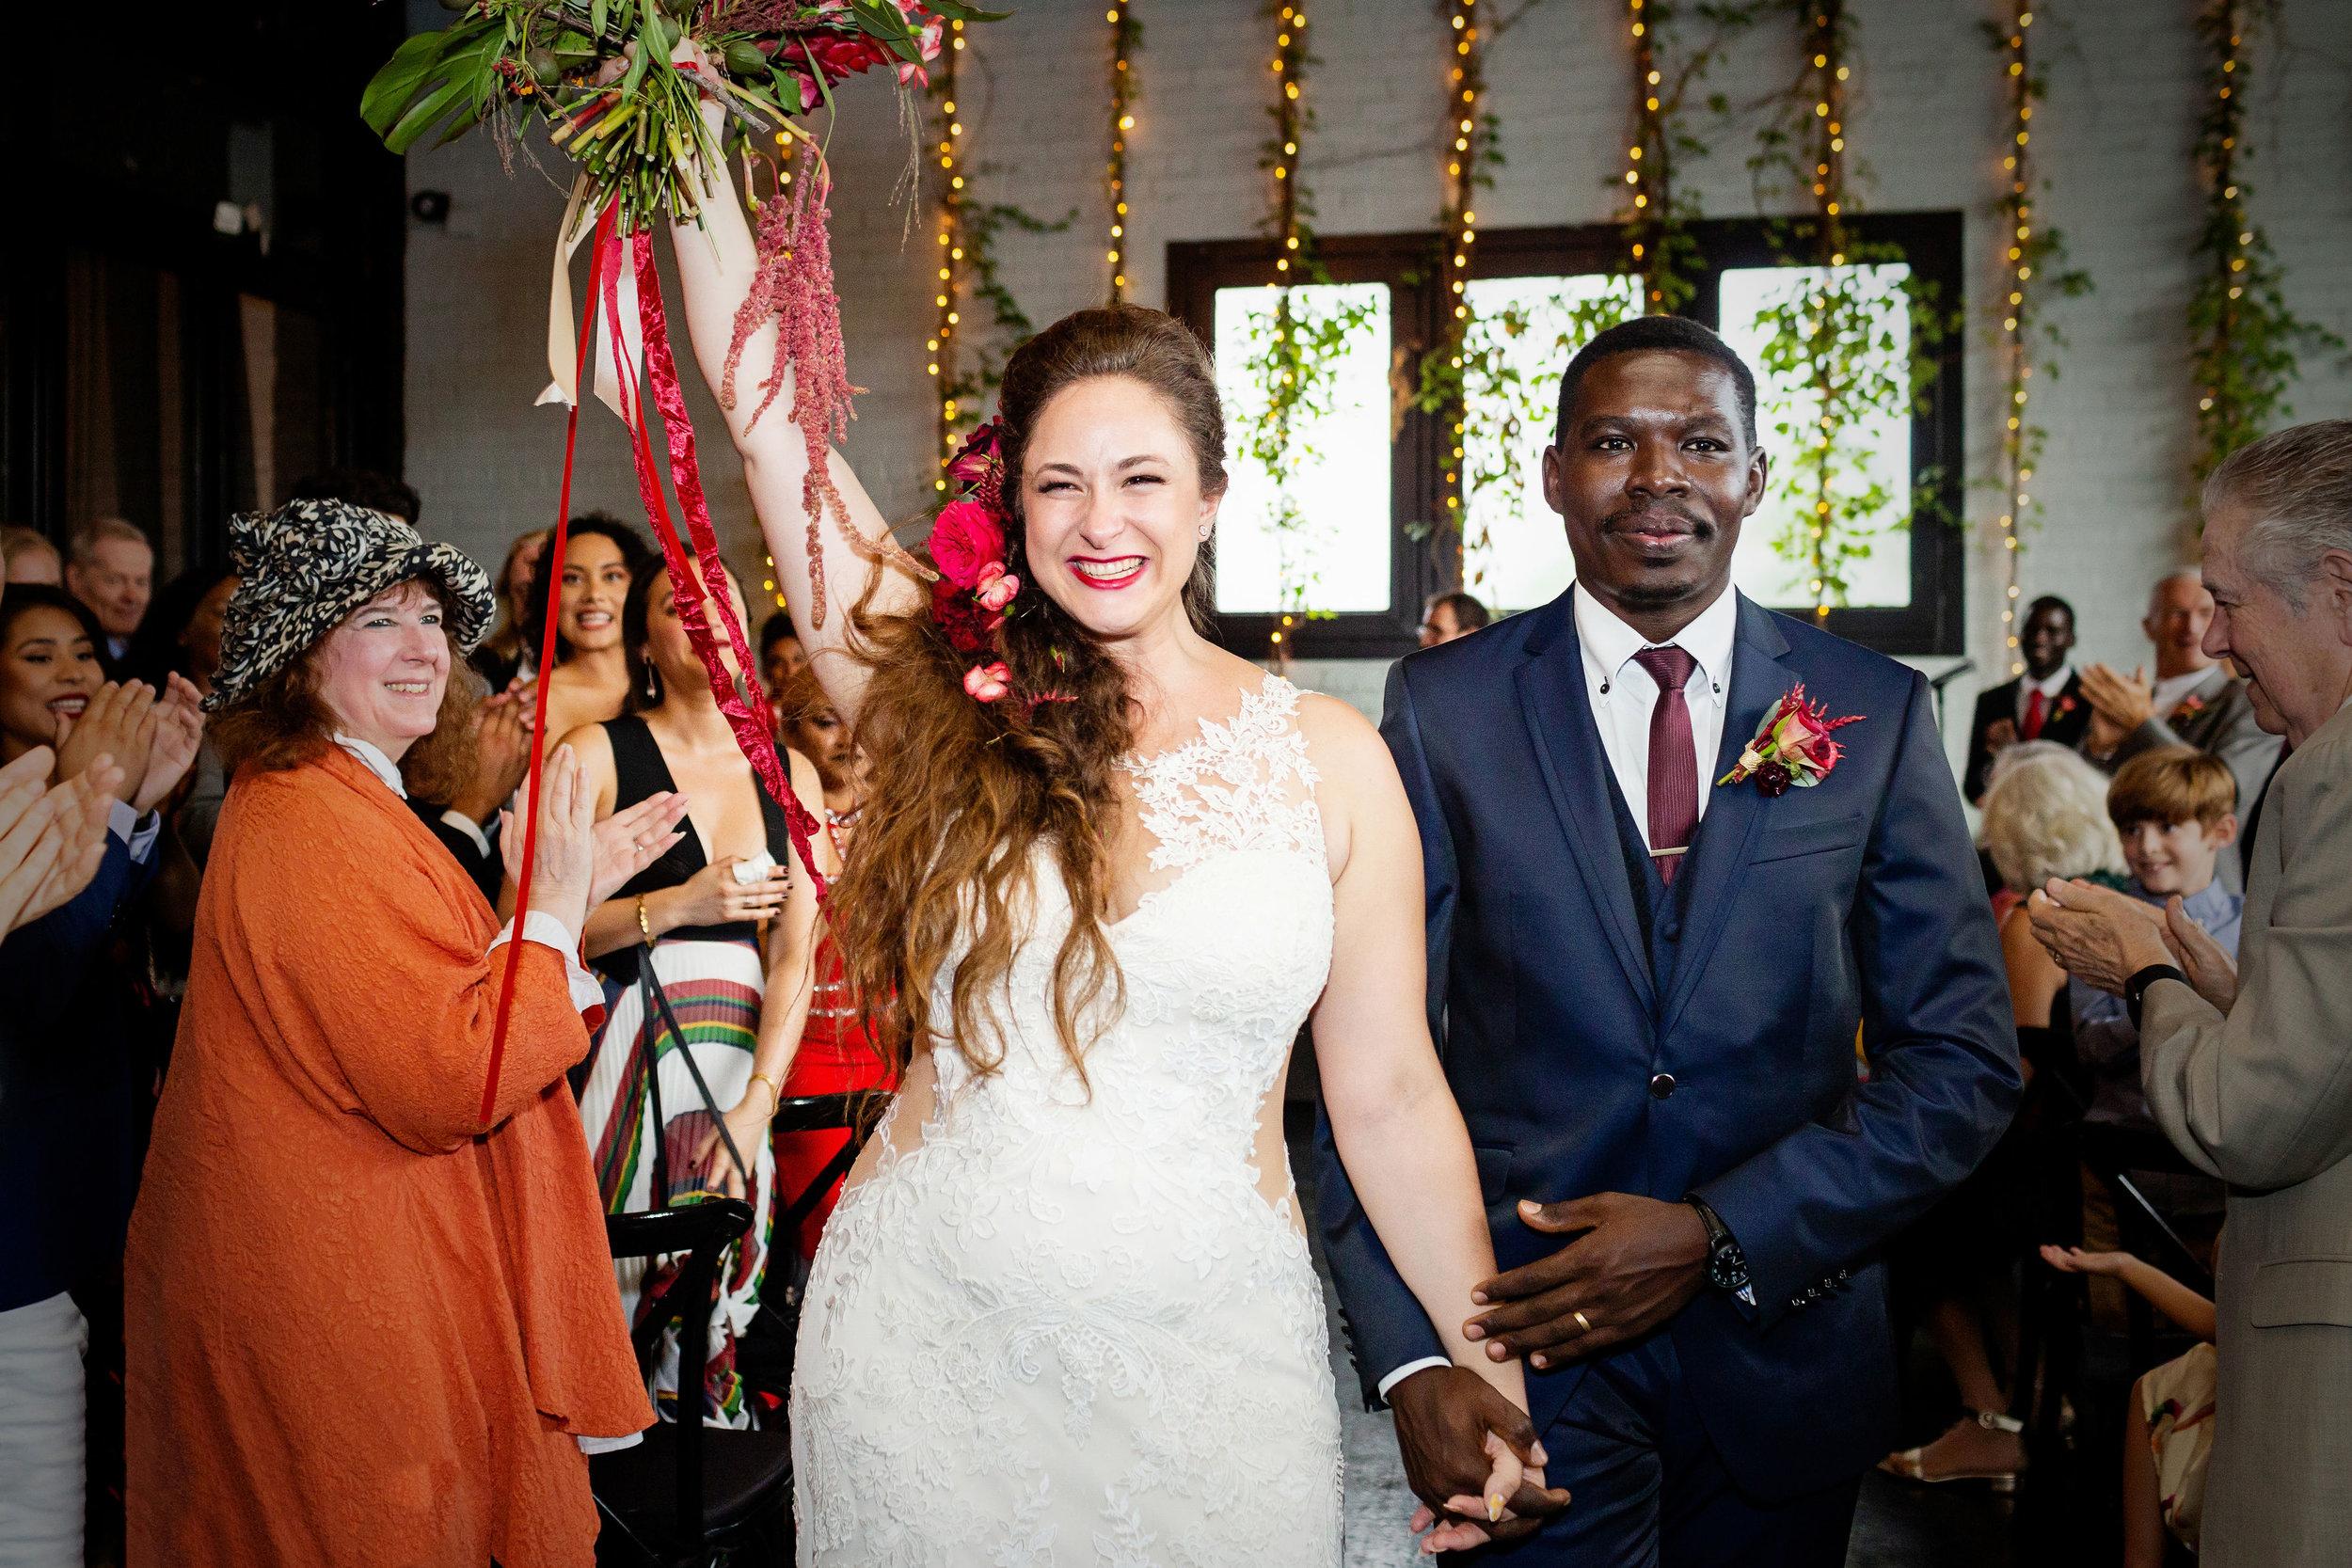 Elizabeth_Joab_multicultural_wedding_Petronella_Photography_697.jpg